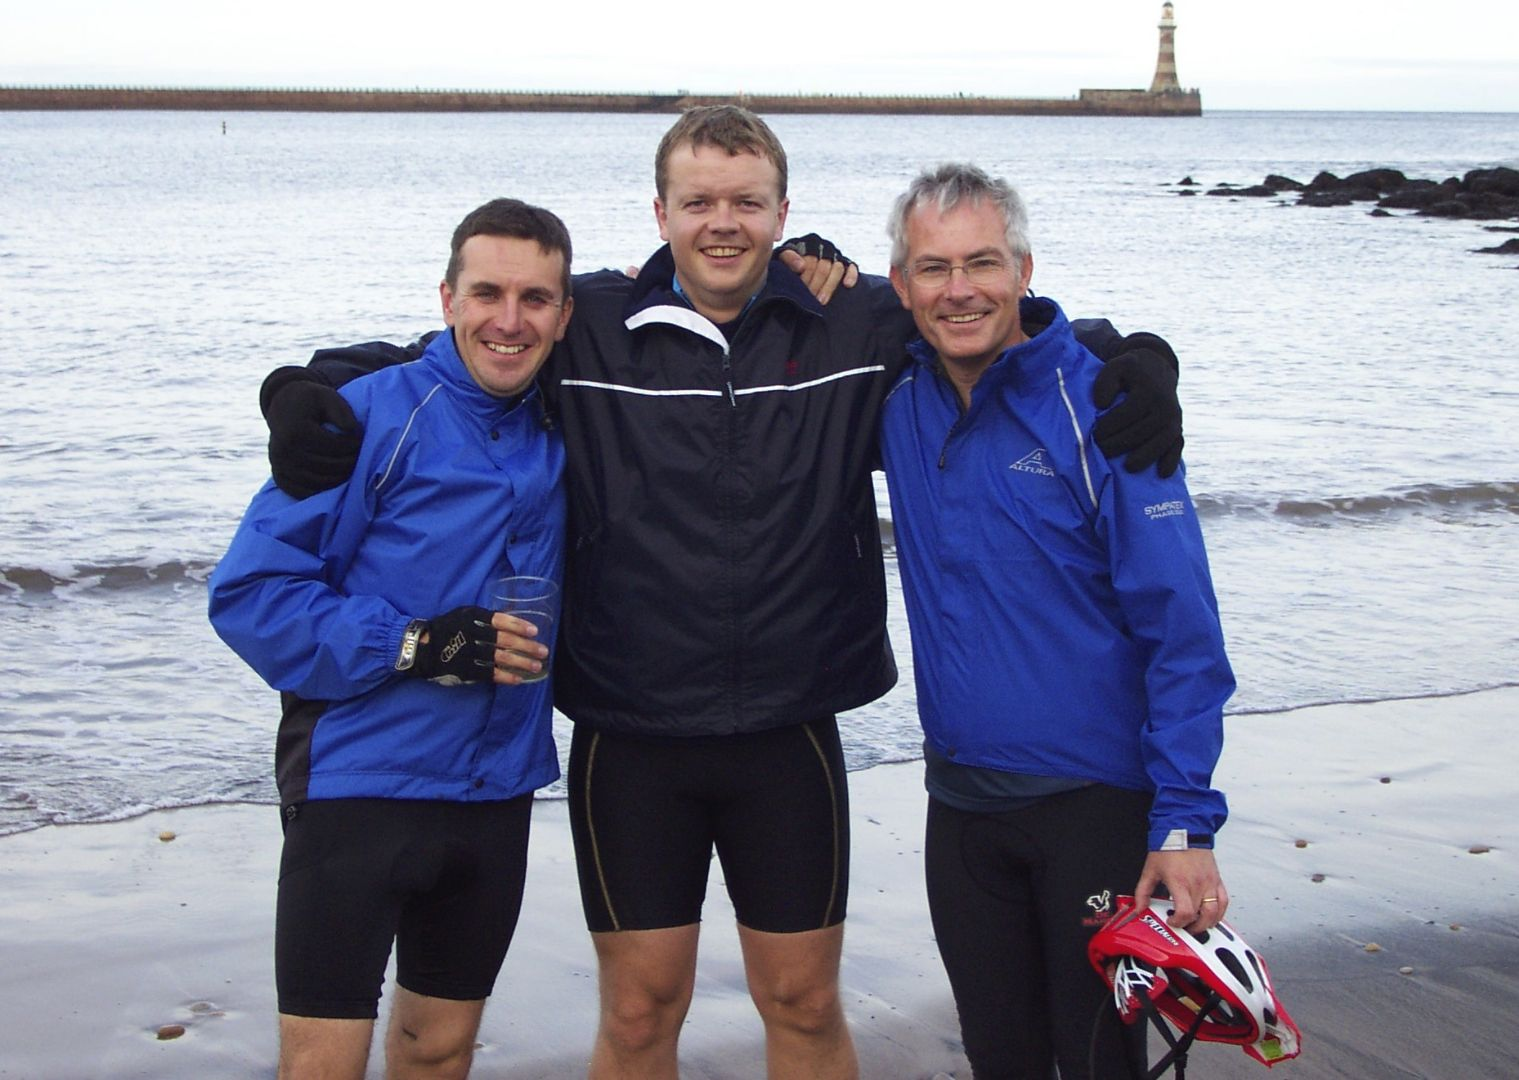 C2C trip 024.jpg - UK - C2C - Coast to Coast 2 Days Cycling - Self-Guided Road Cycling Holiday - Road Cycling